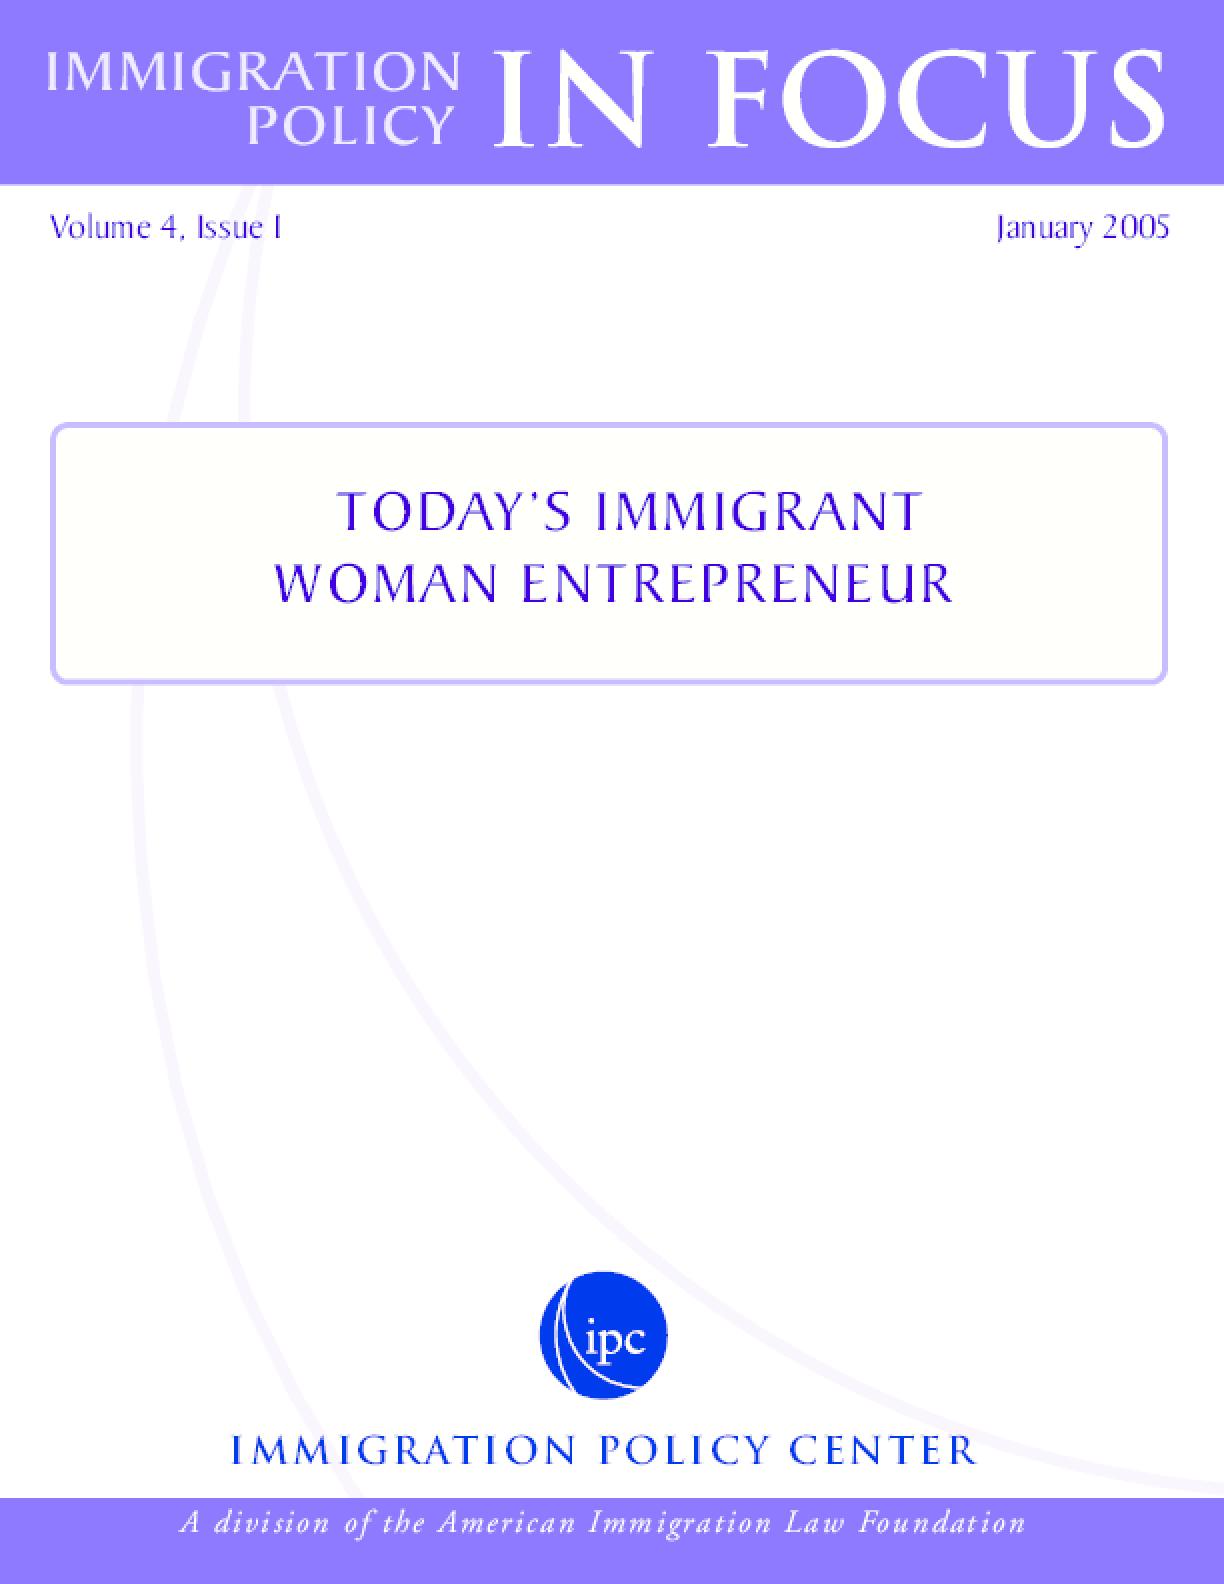 Today's Immigrant Woman Entrepreneur